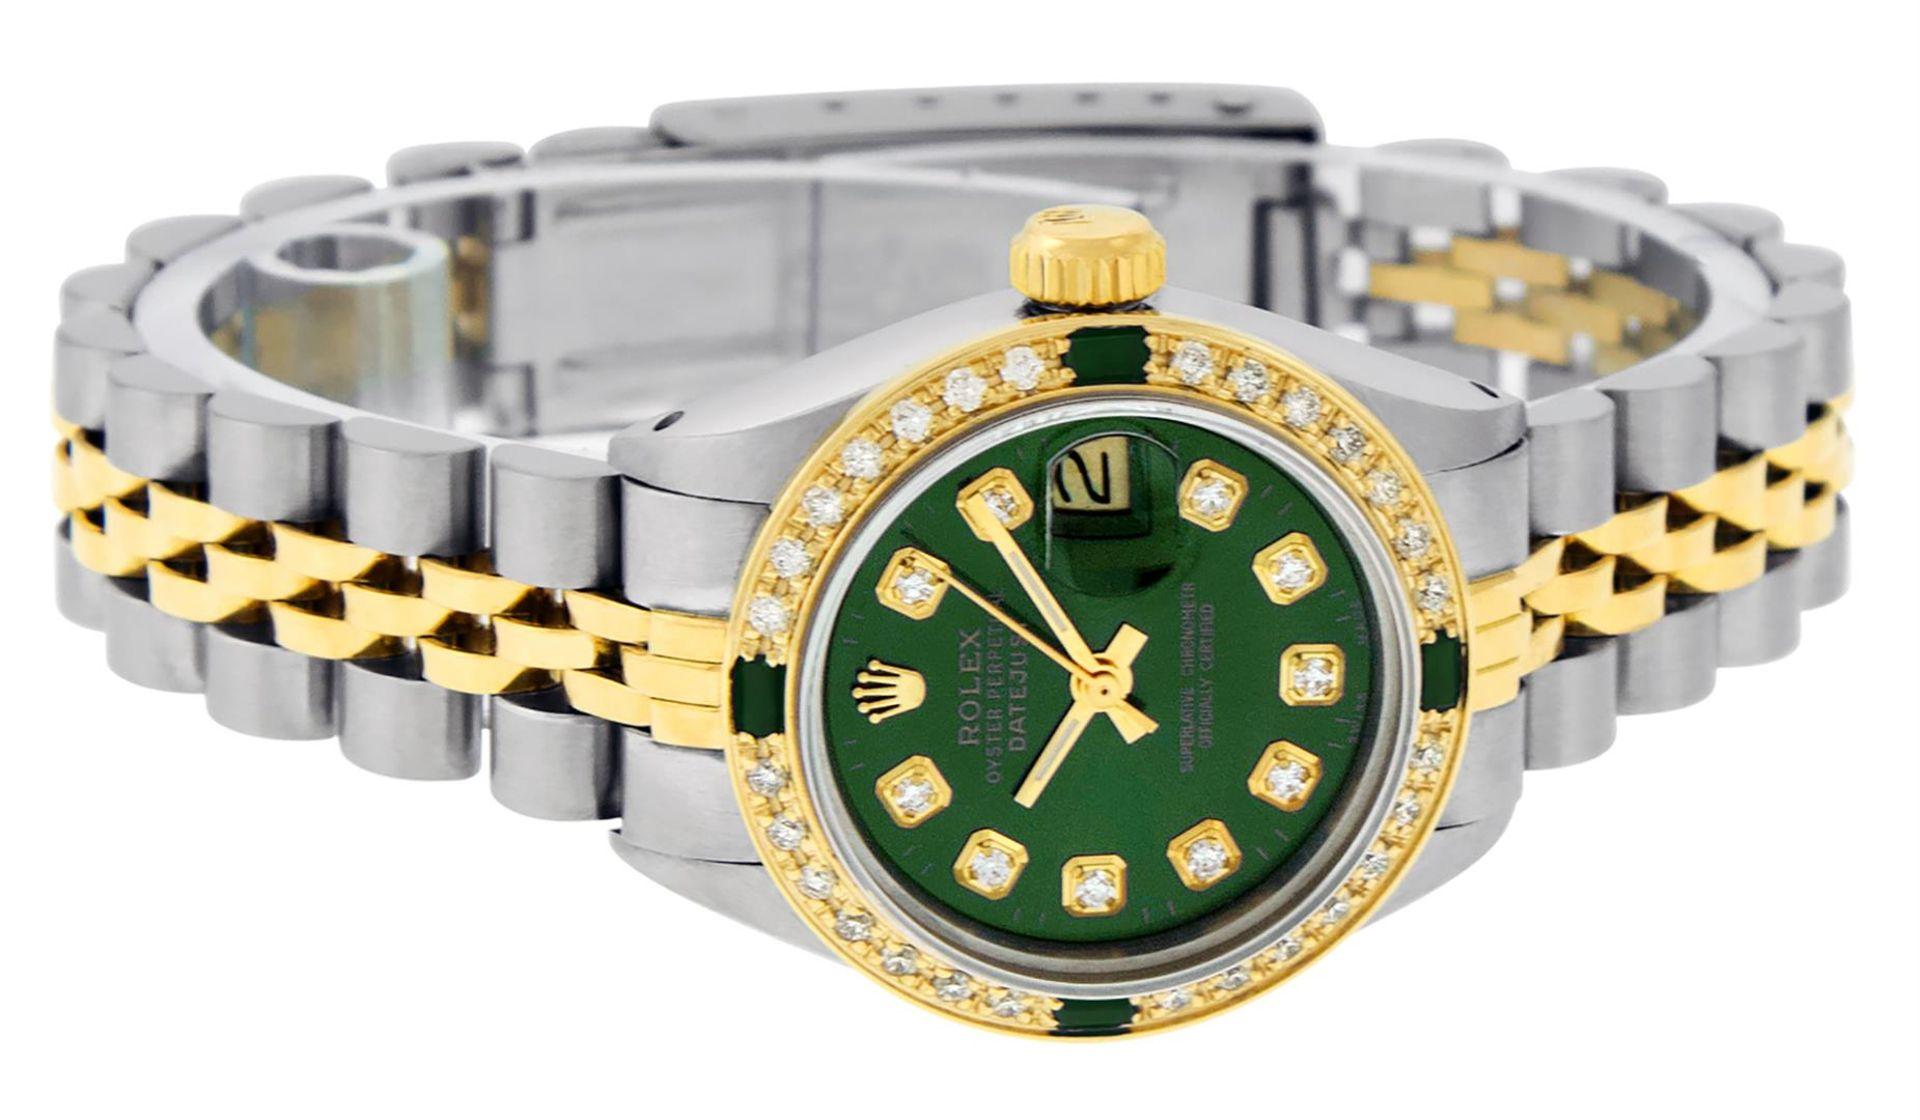 Rolex Ladies 2 Tone Green Diamond & Emerald Datejust Wristwatch - Image 4 of 9